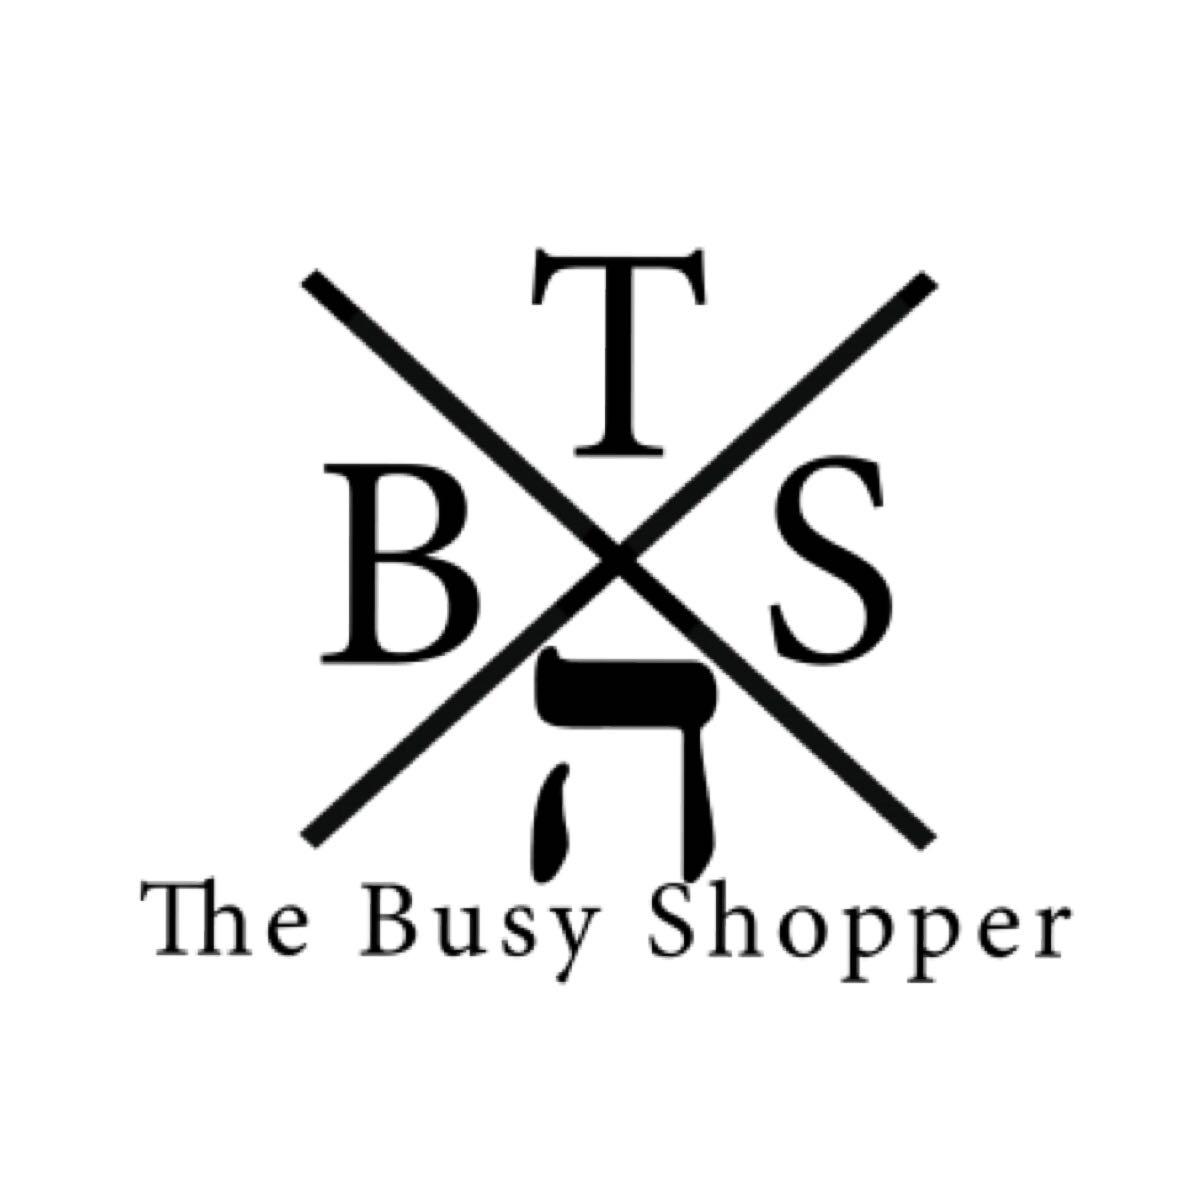 thebusyshopper